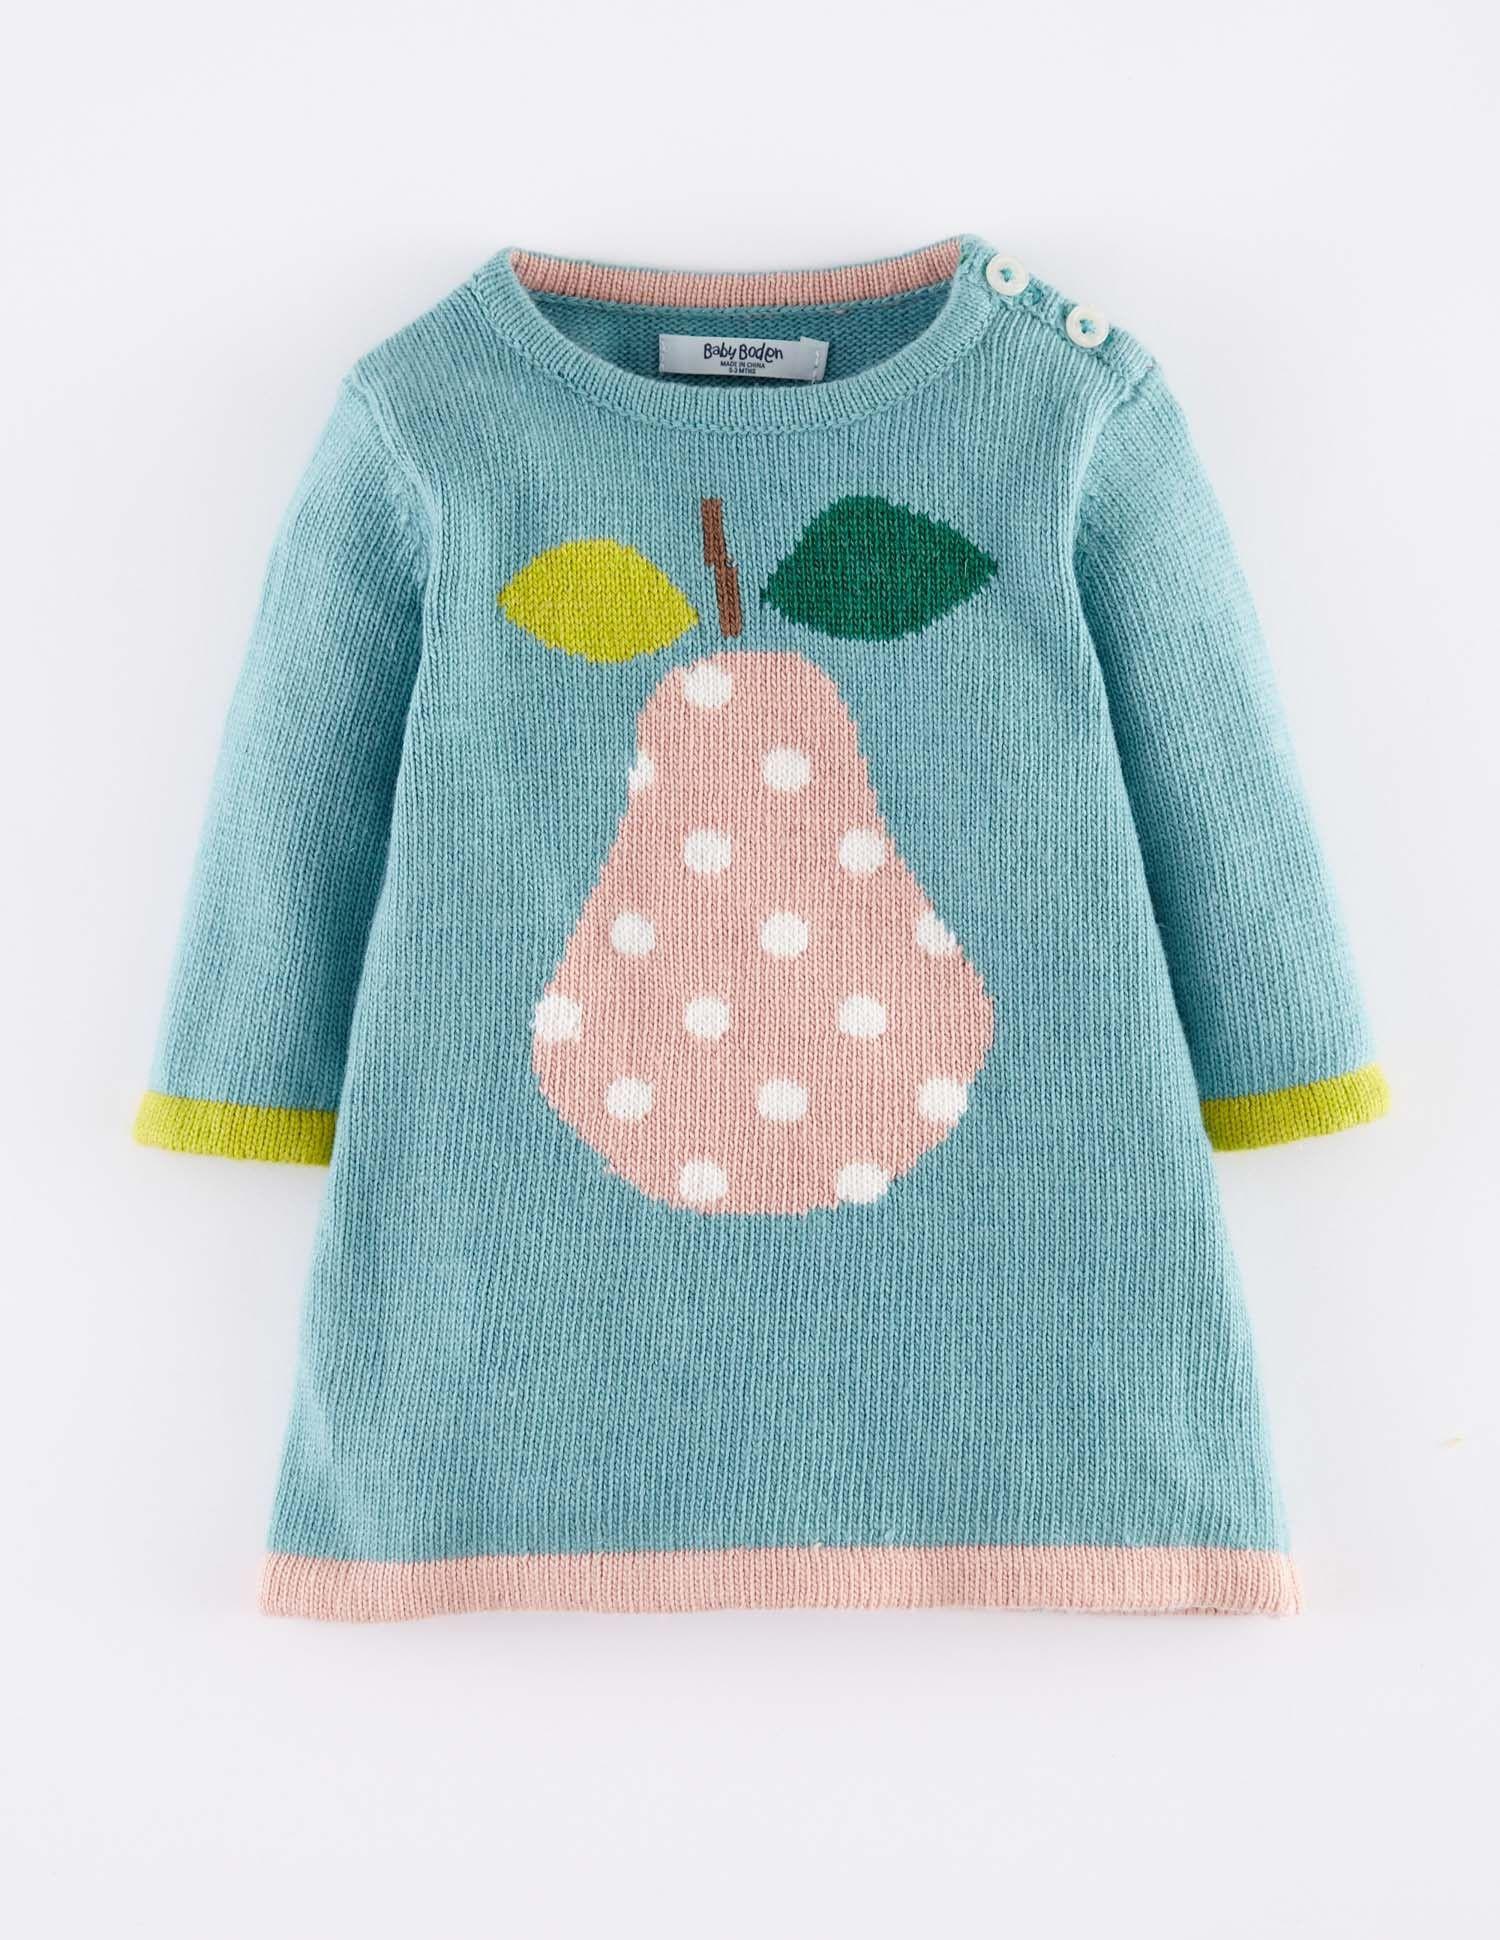 http://www.boden.co.uk/en-GB/Baby-0-3yrs-Dresses/71375/Baby-0-3yrs ...